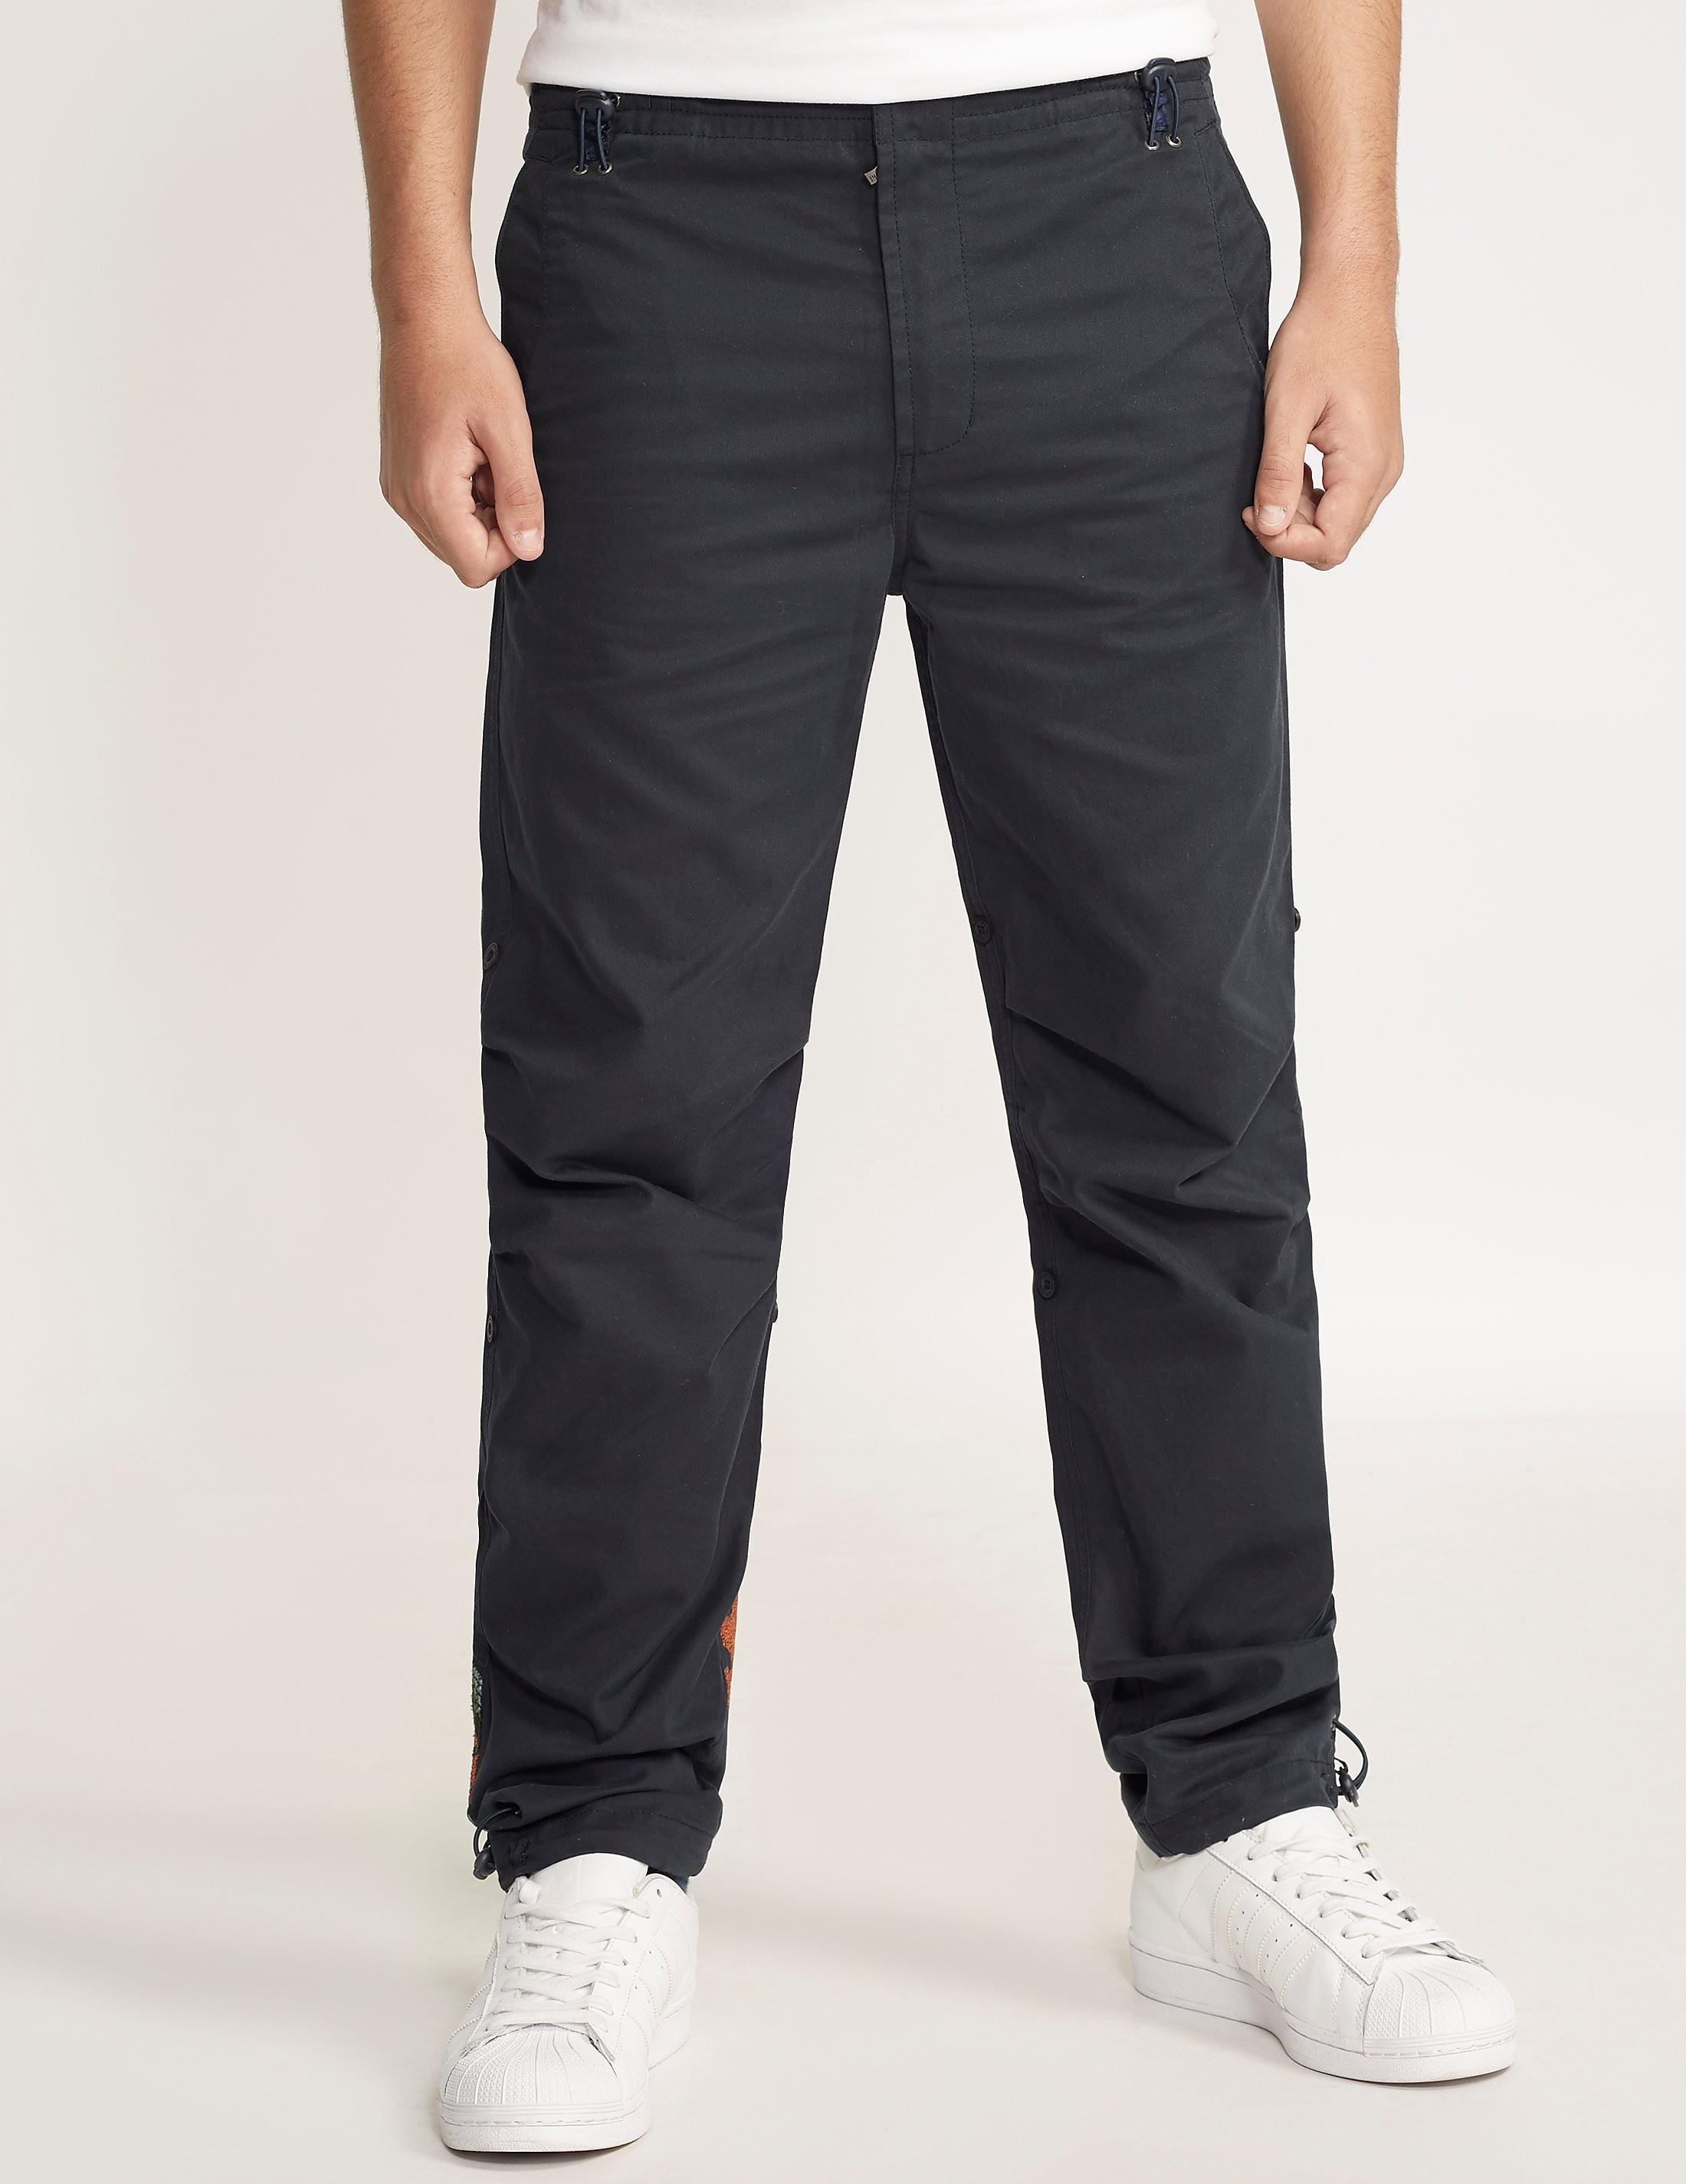 Maharishi Croc Track Pants